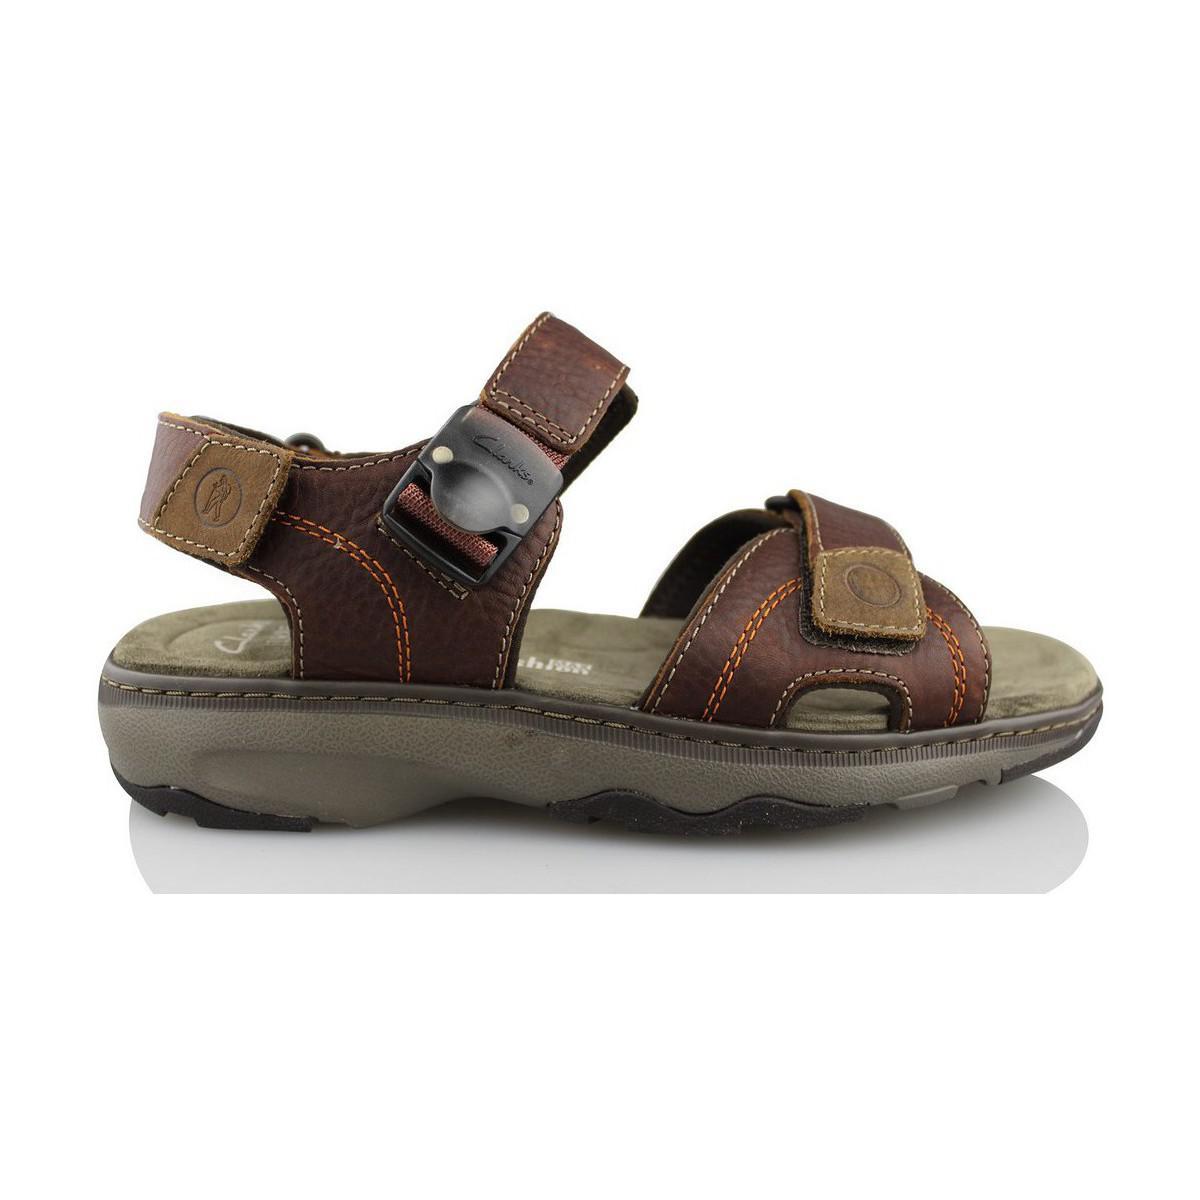 604b16d1aefc Clarks Raffe Sun Men s Sandals In Brown in Brown for Men - Lyst